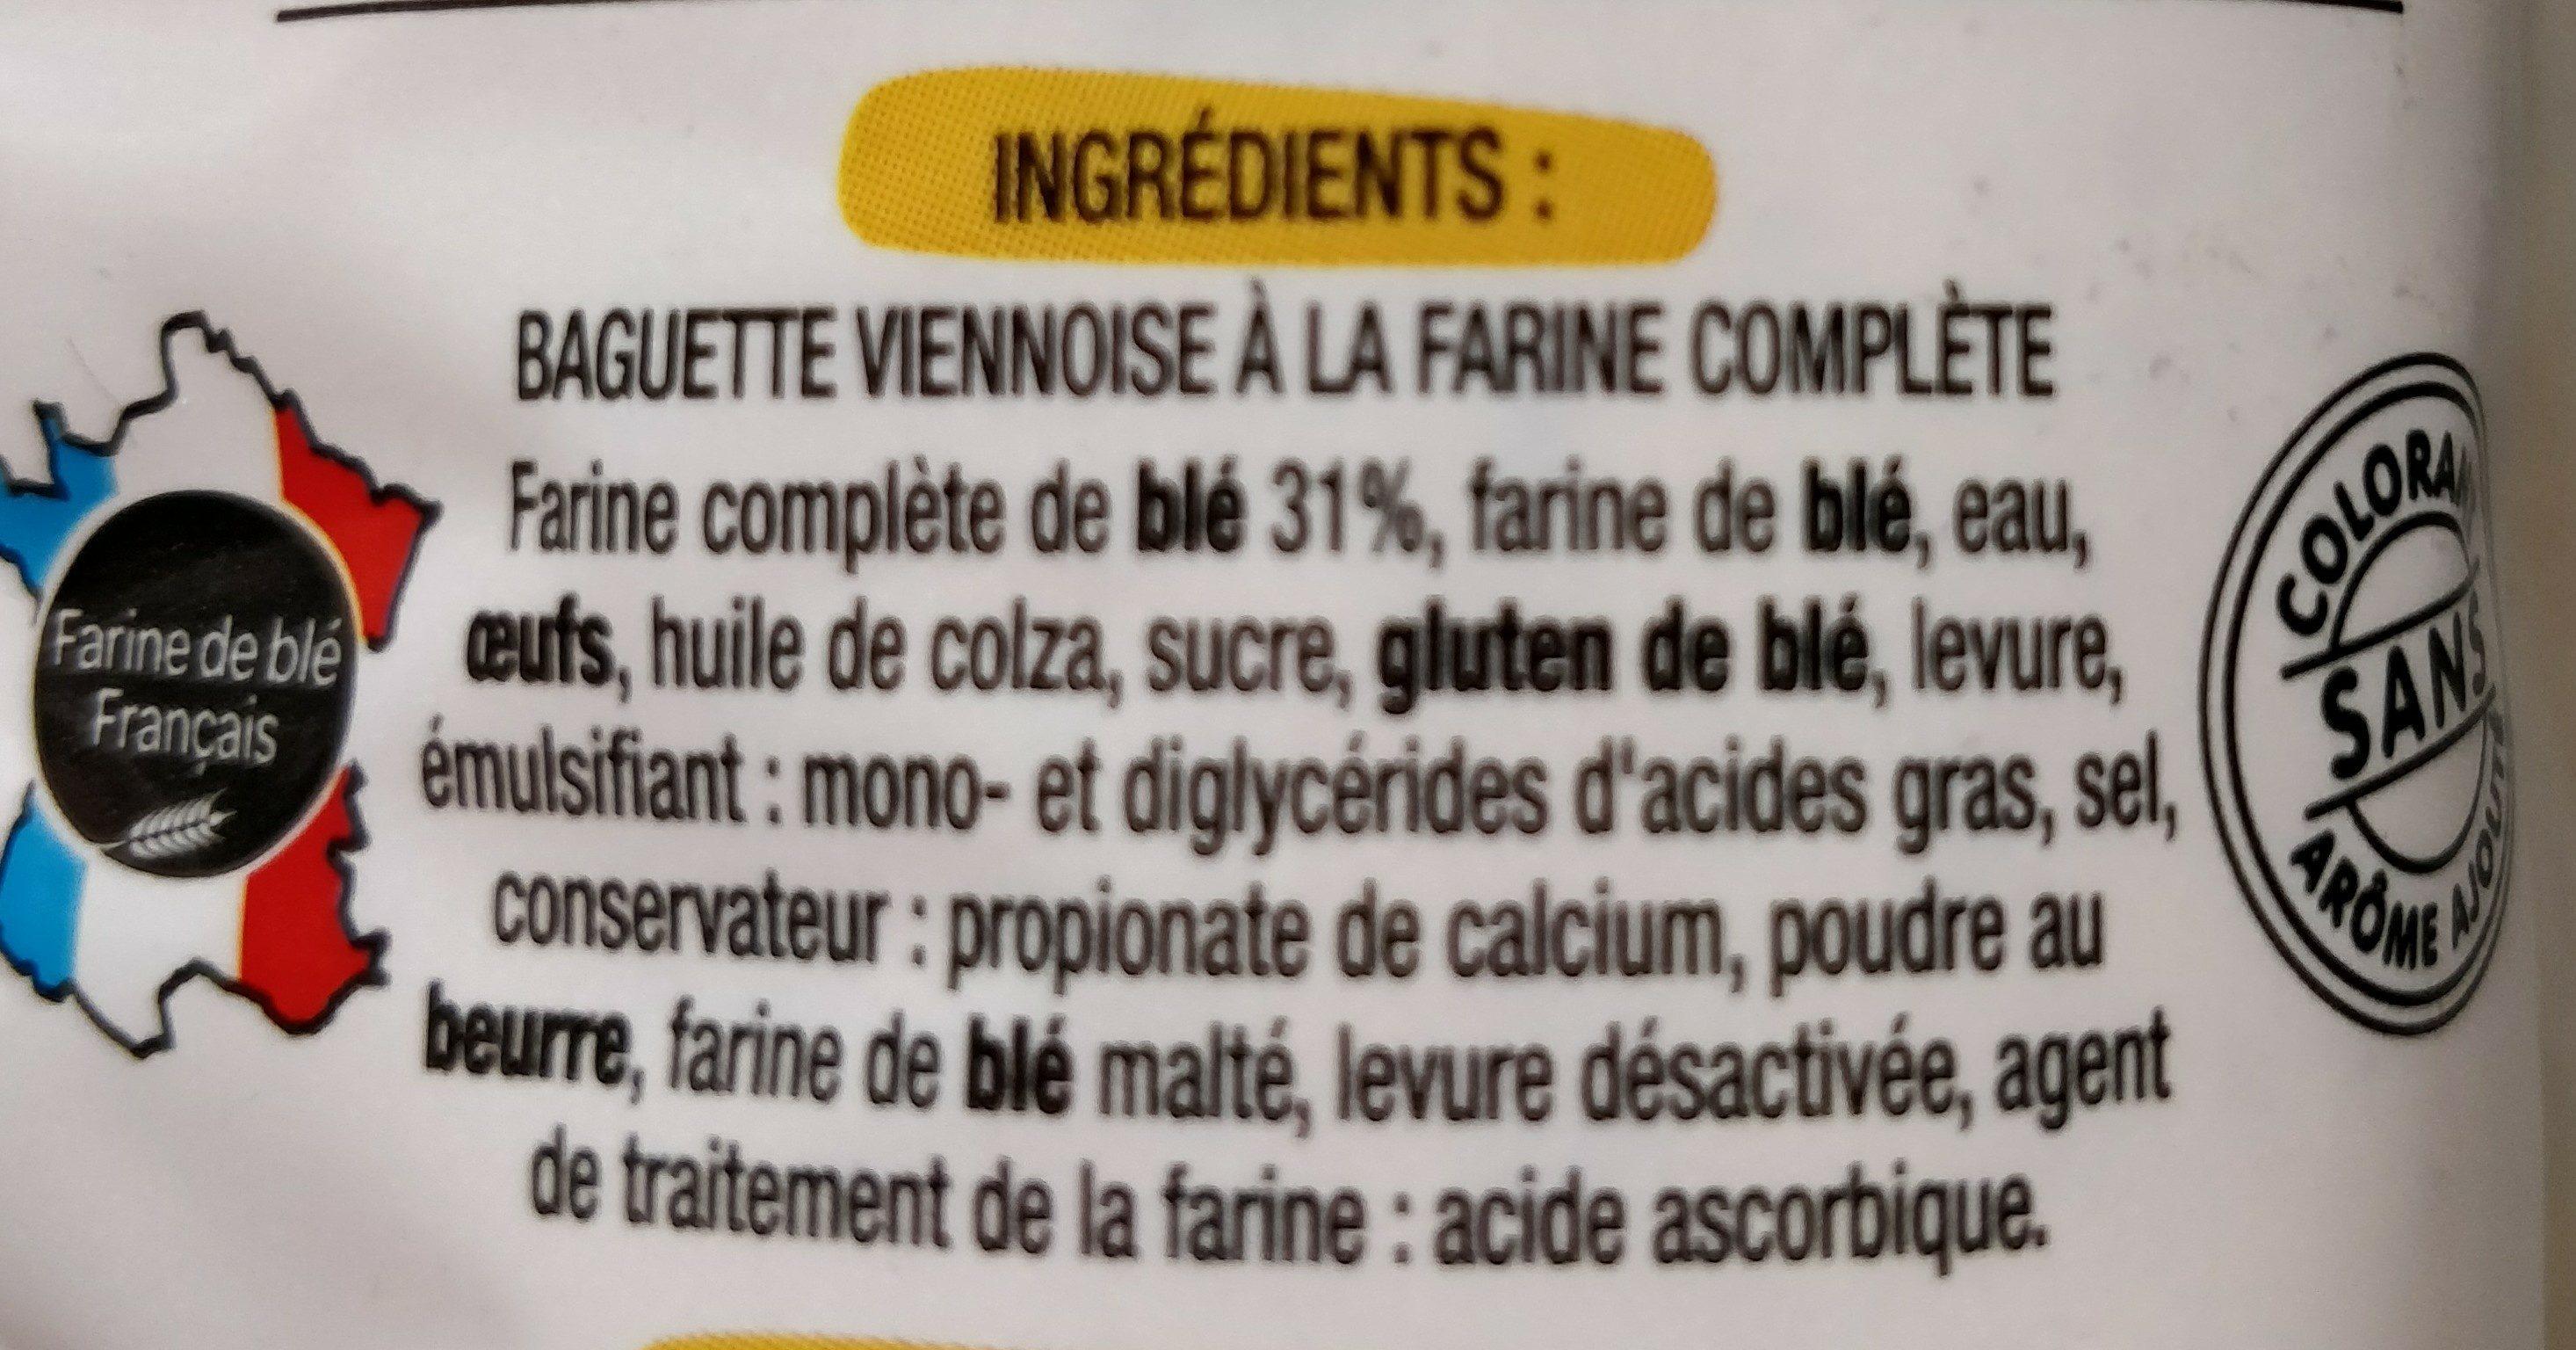 Baguette viennoise farine complète - Ingredienti - fr